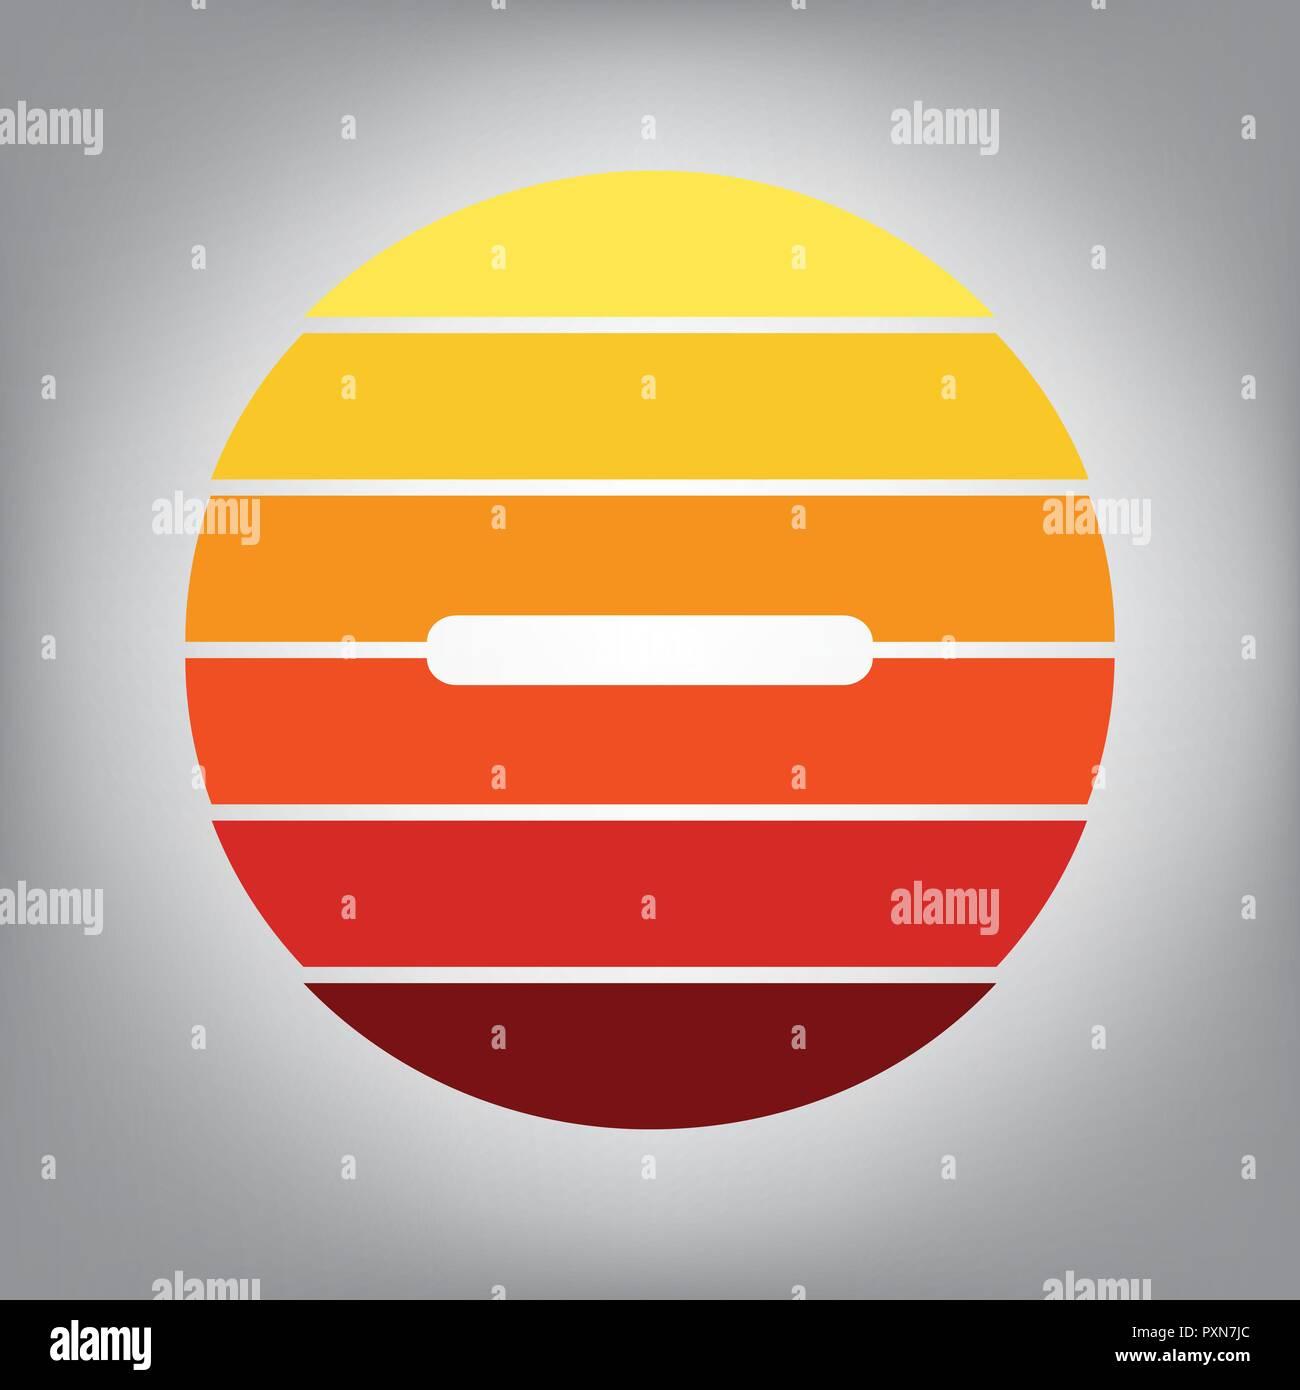 Negative Farben.Negative Symbol Abbildung Minuszeichen Vektor Horizontal